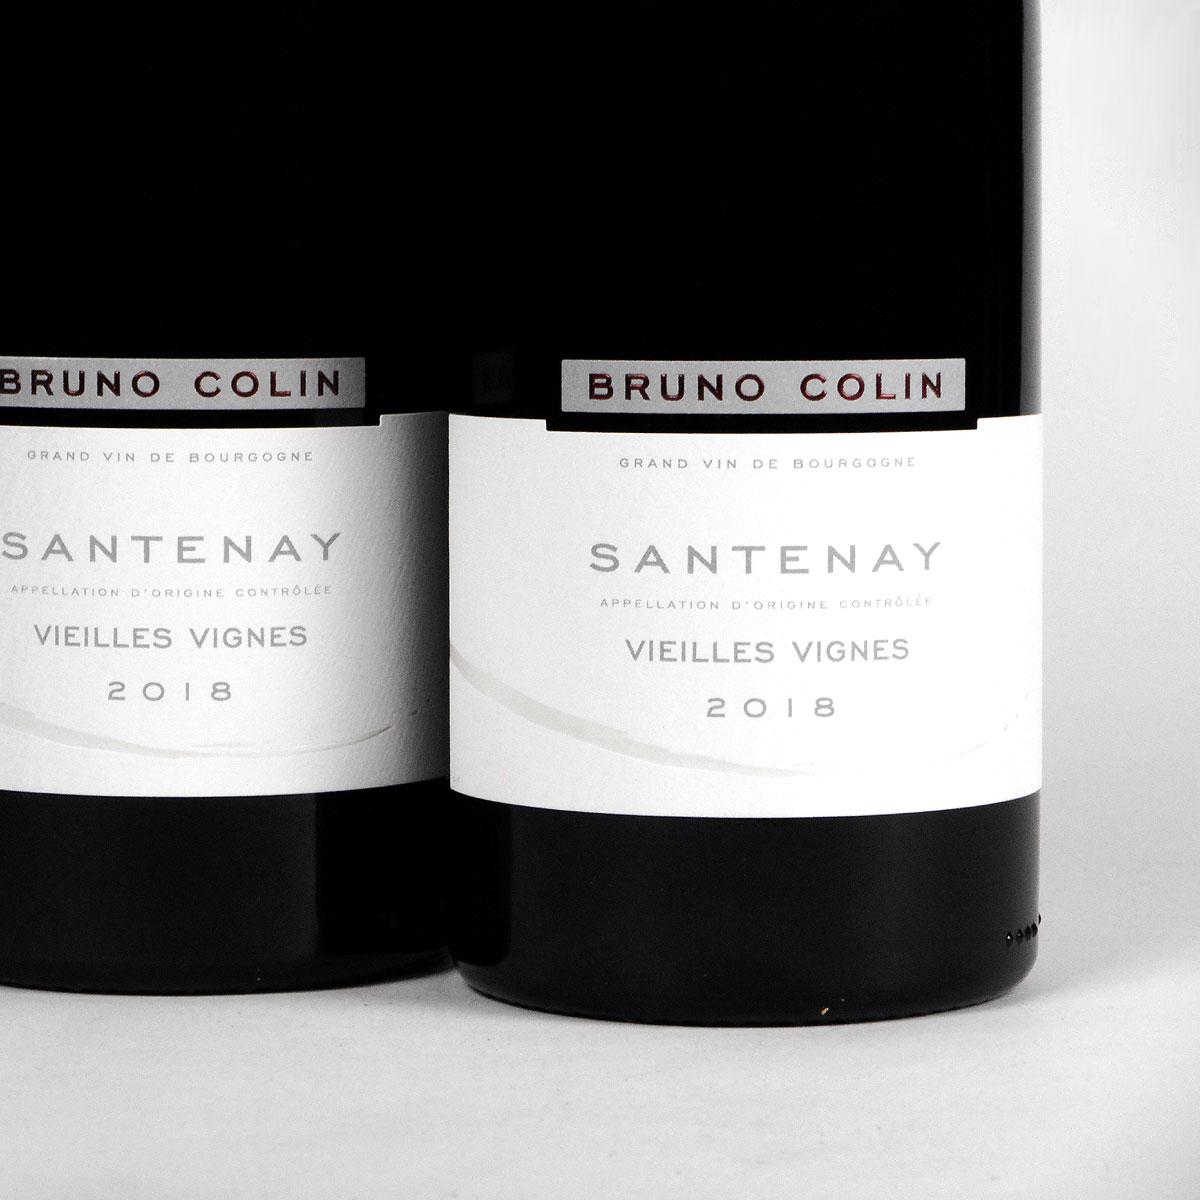 Santenay: Domaine Bruno Colin 'Vieilles Vignes' 2018